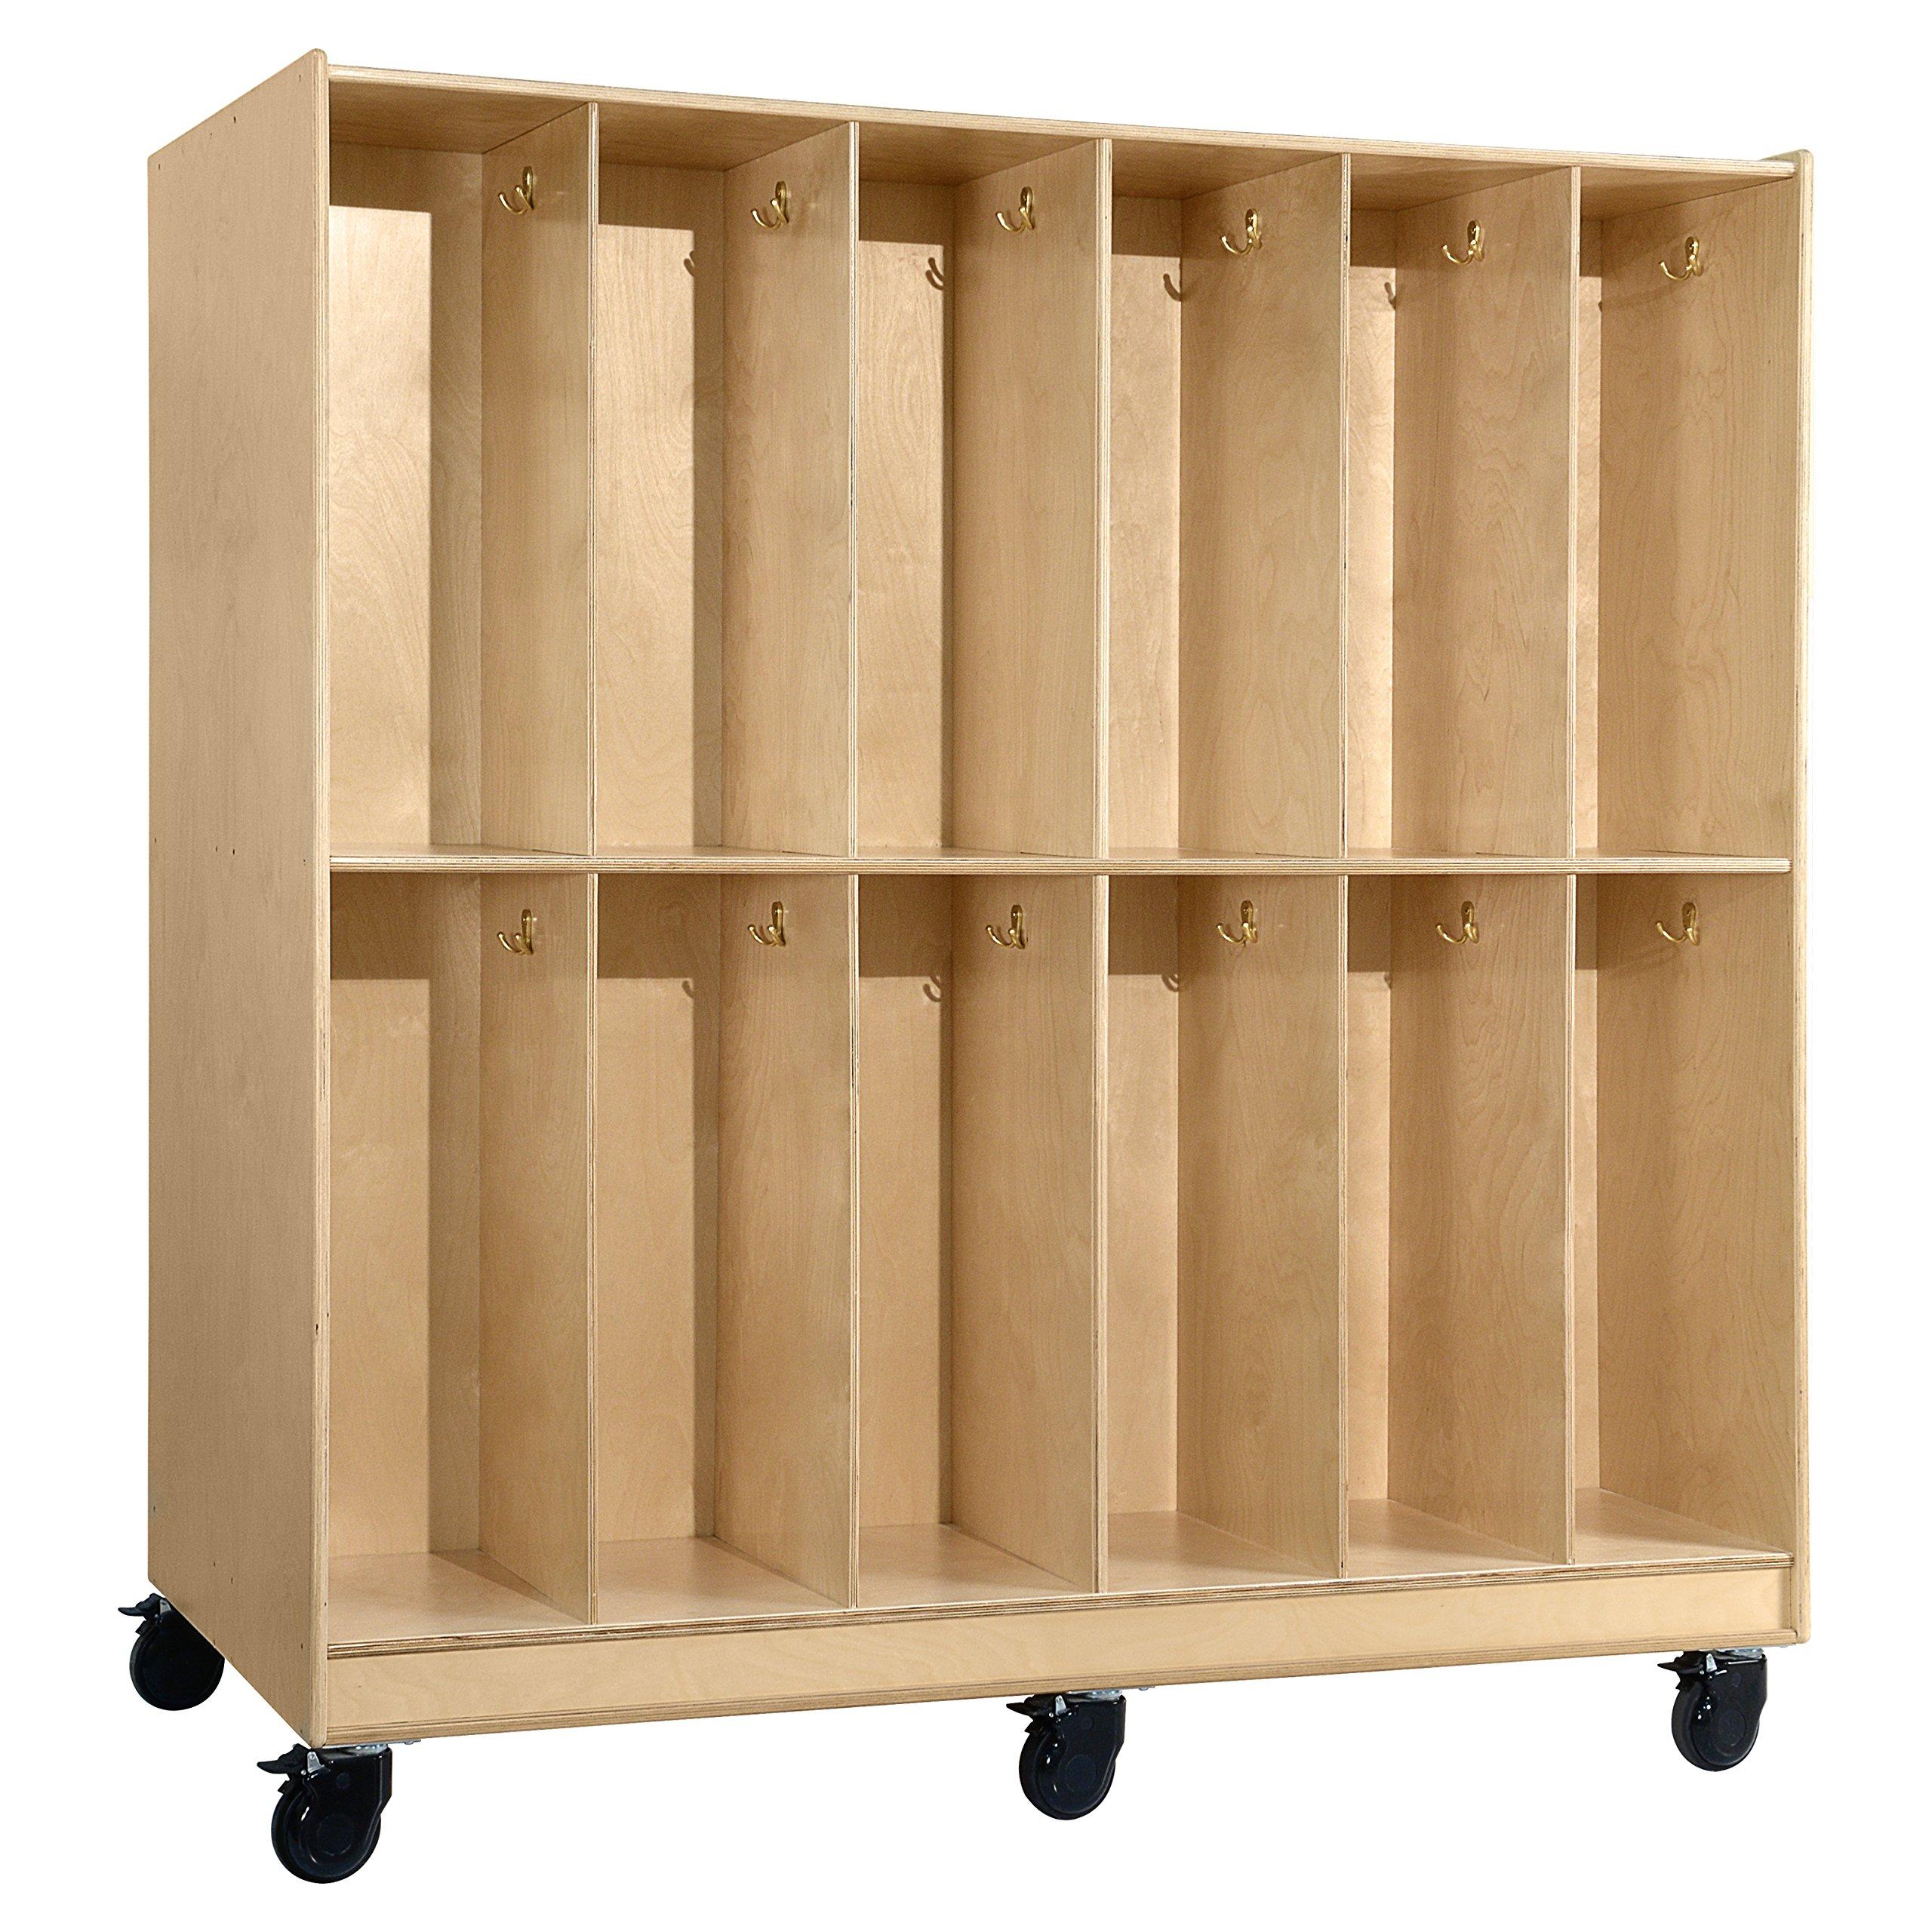 Wood Designs 991264 Mobile 24 Section Locker, Natural